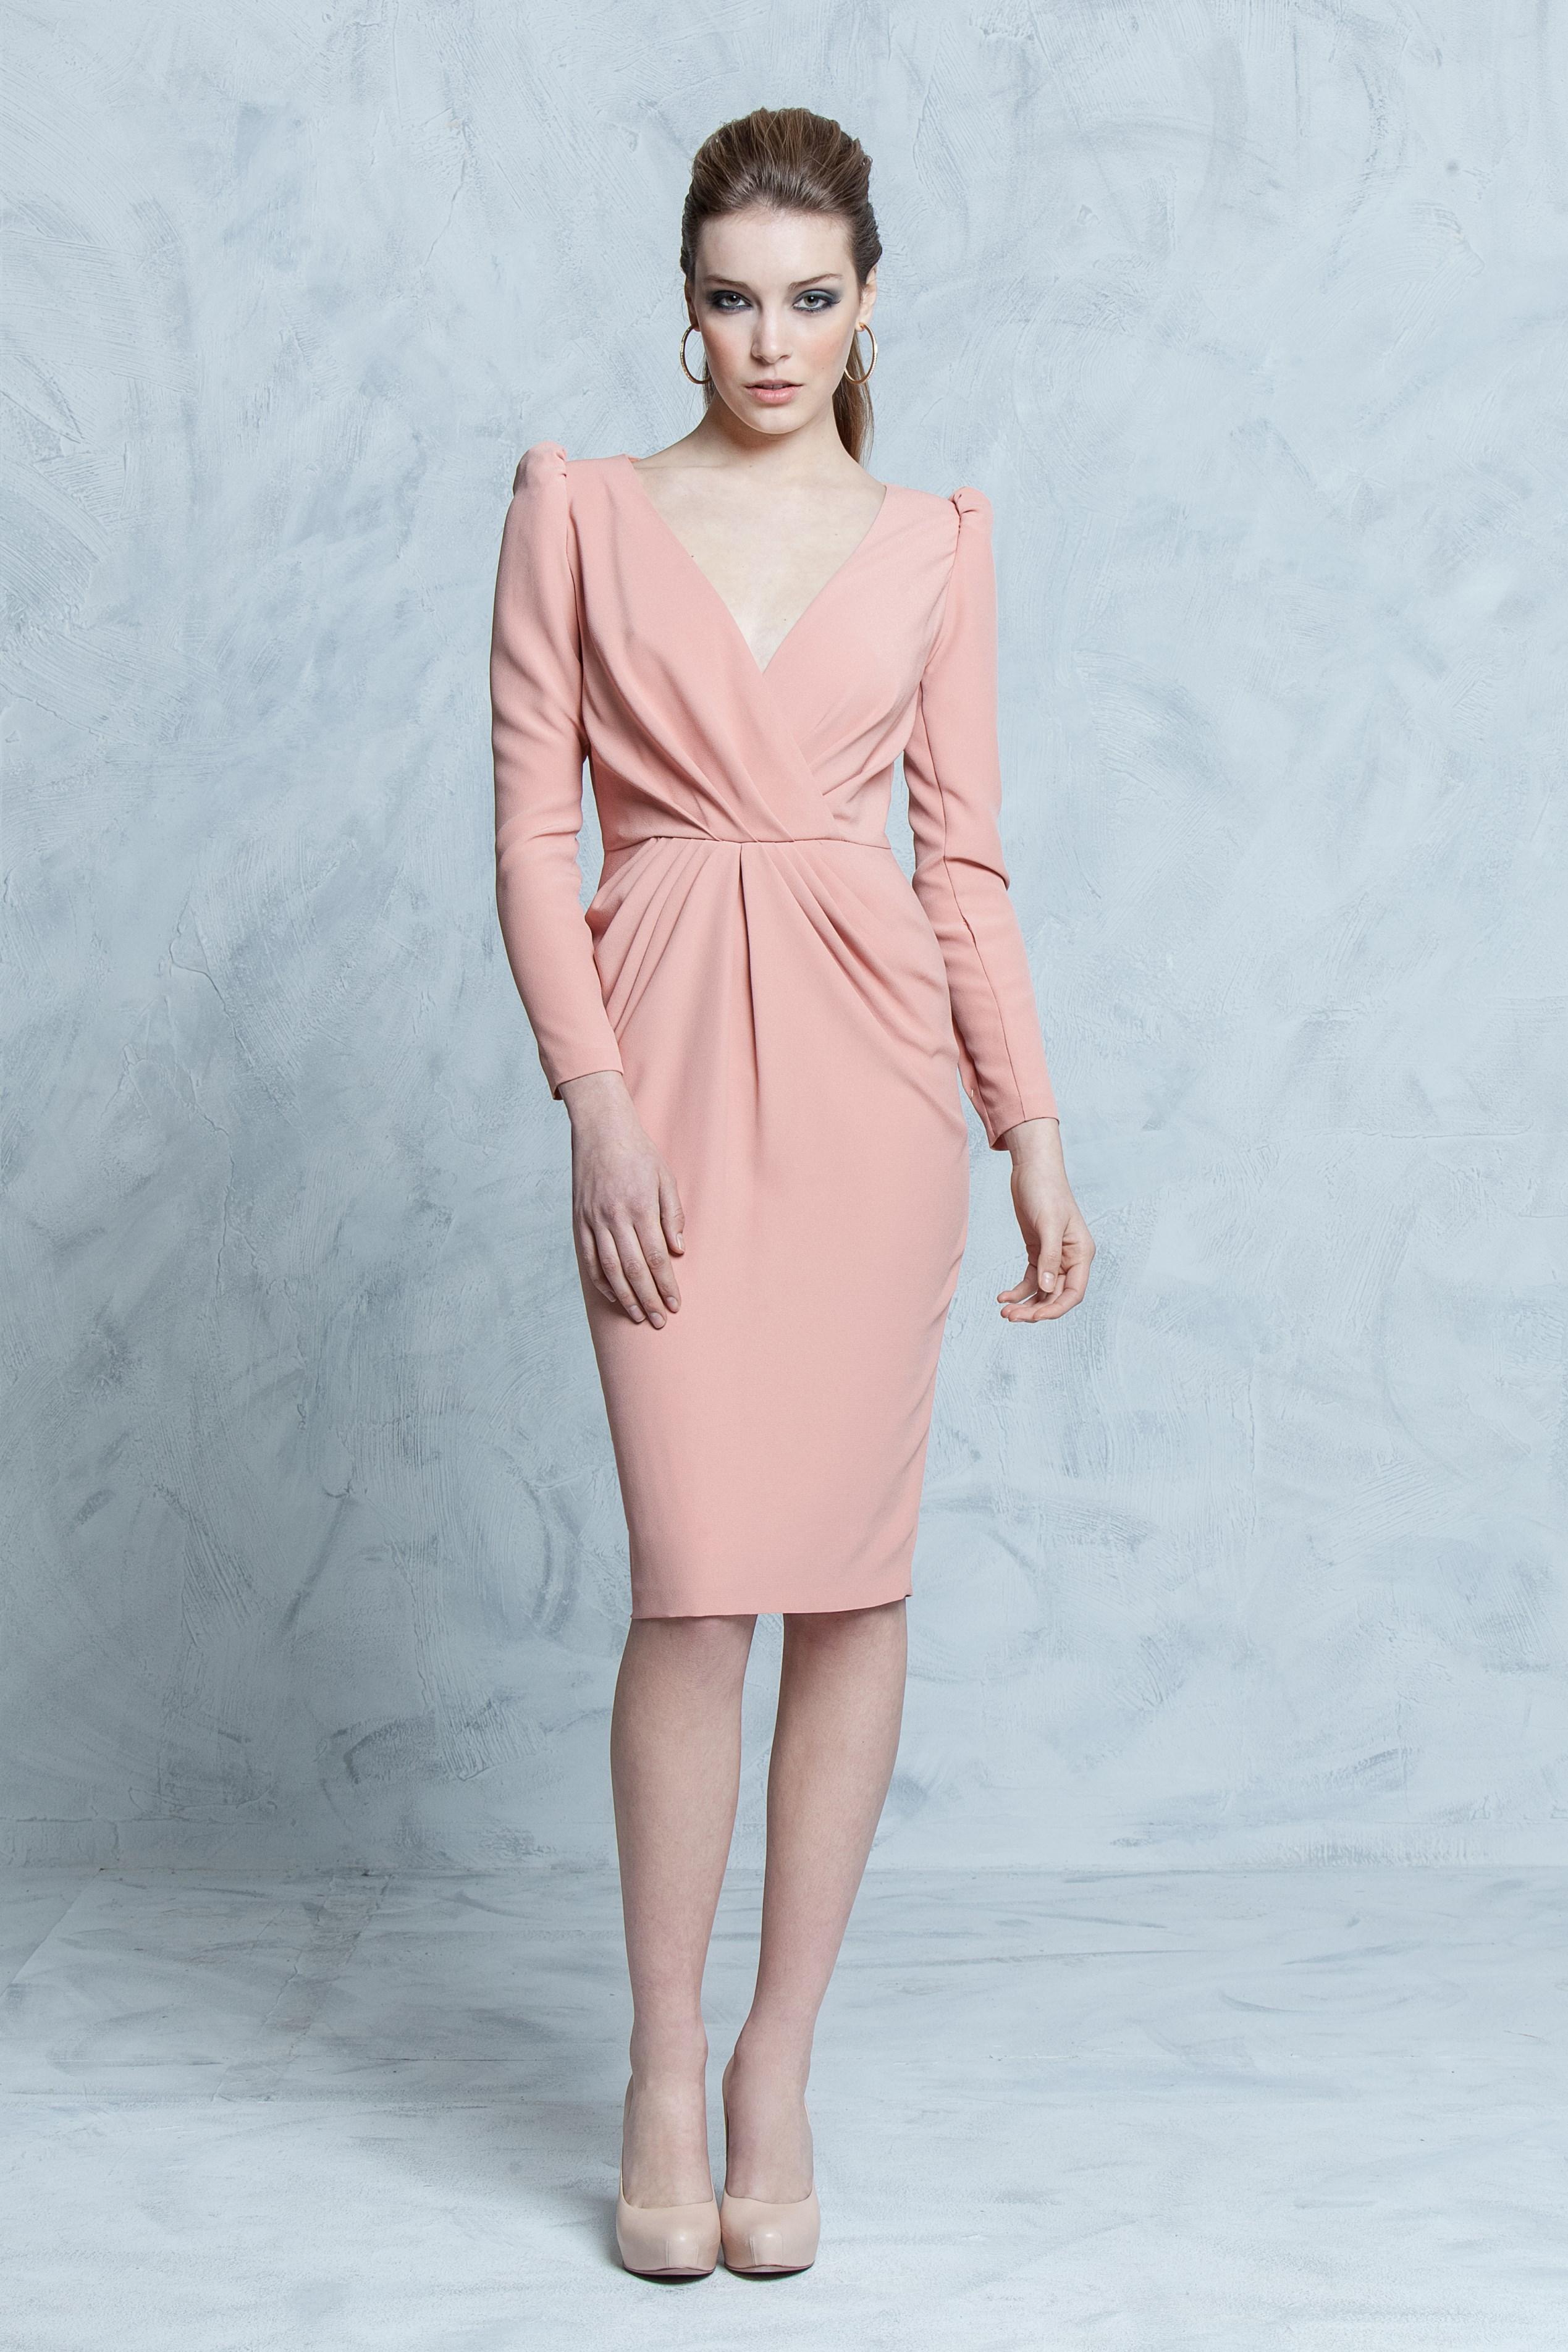 Miedoso Modeladoras Para El Vestido De Novia Ideas Ornamento ...